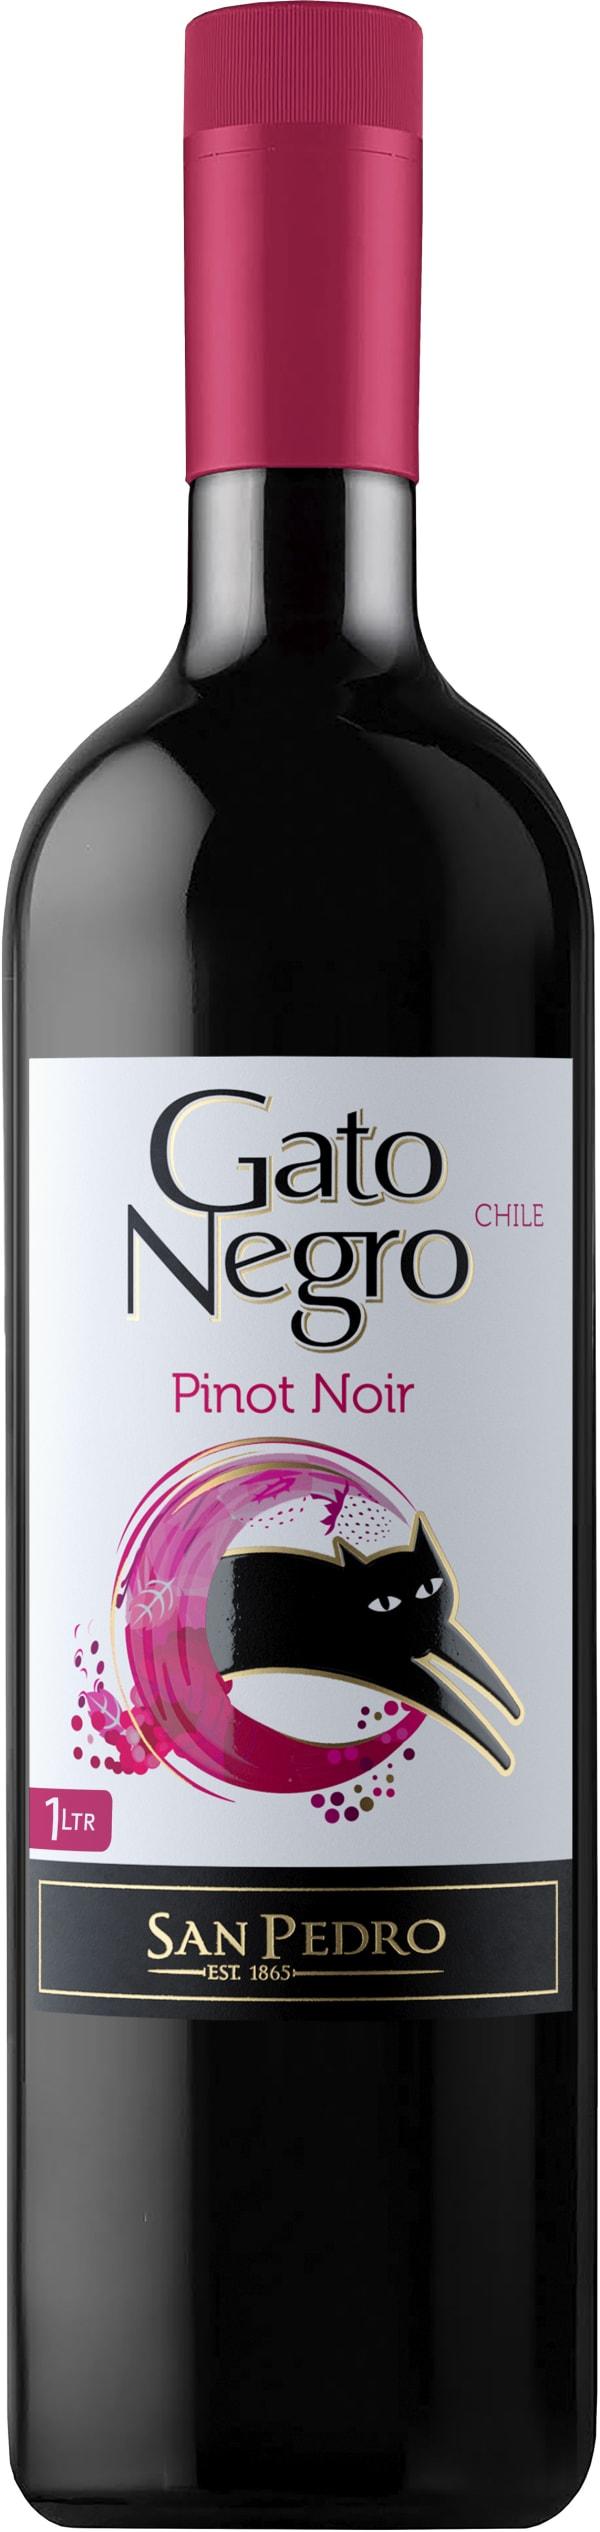 Gato Negro Pinot Noir 2017 muovipullo